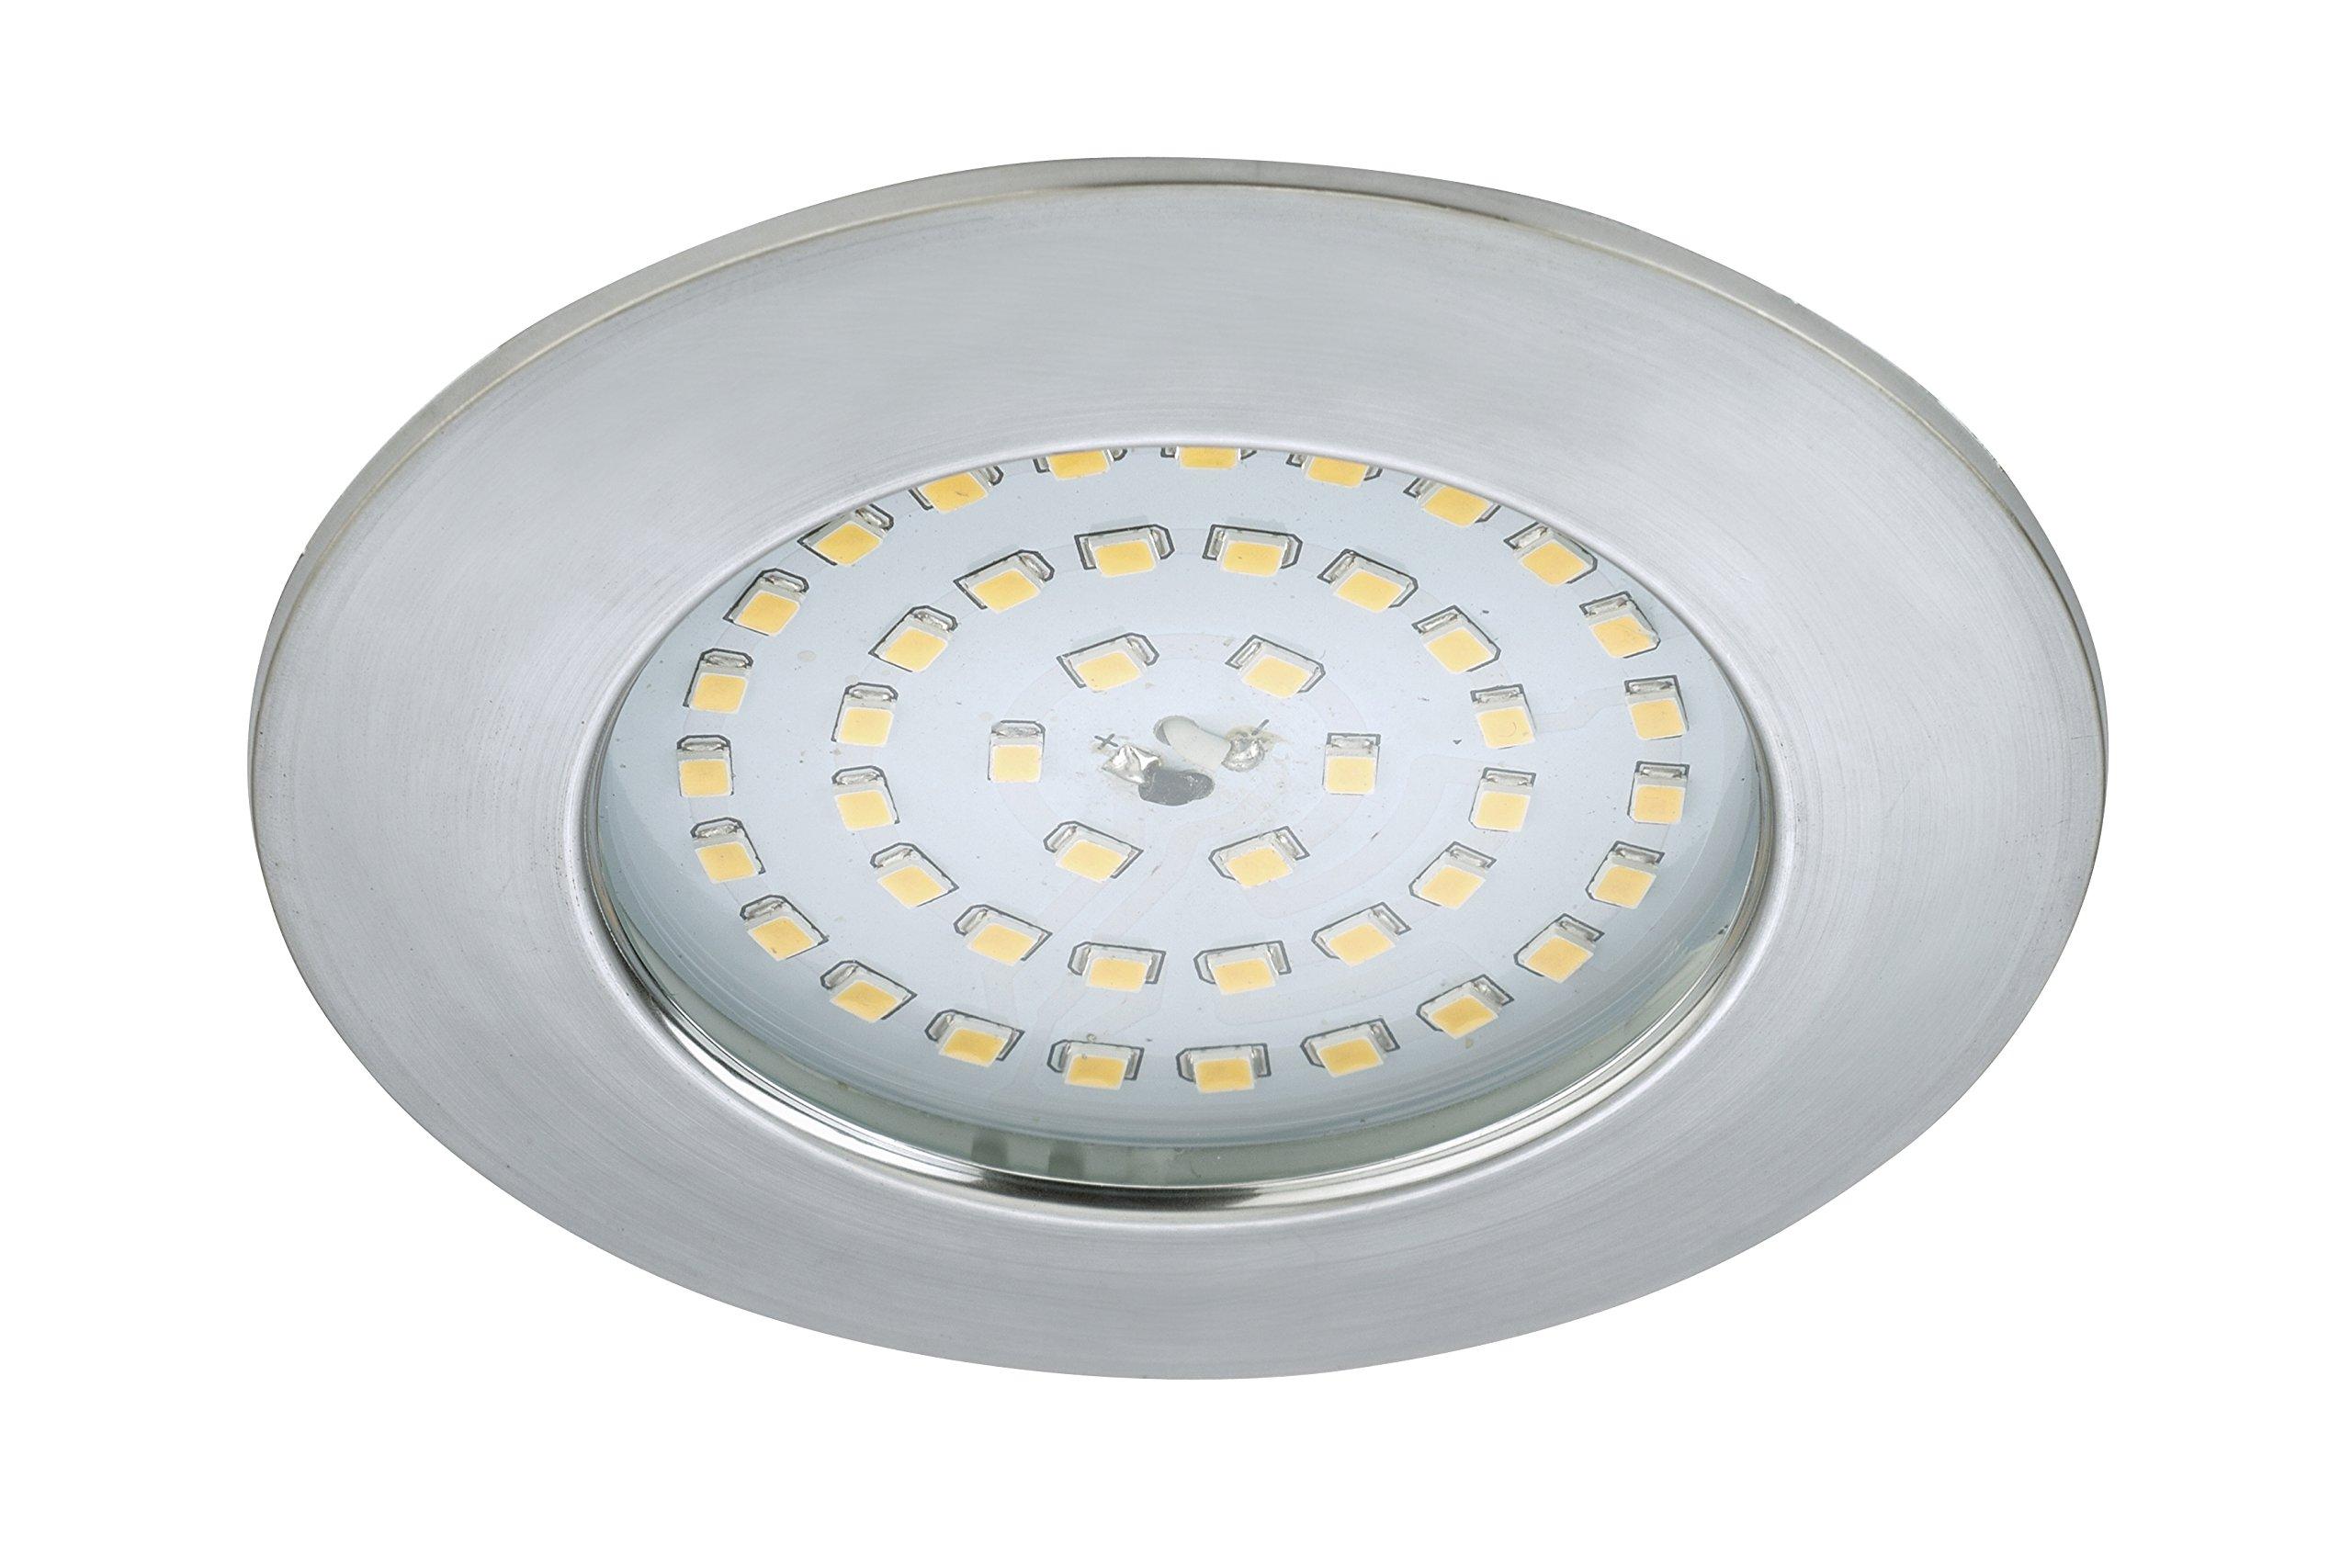 briloner leuchten led light bulb 10 5 w aluminium coloured 7206 019 ebay. Black Bedroom Furniture Sets. Home Design Ideas